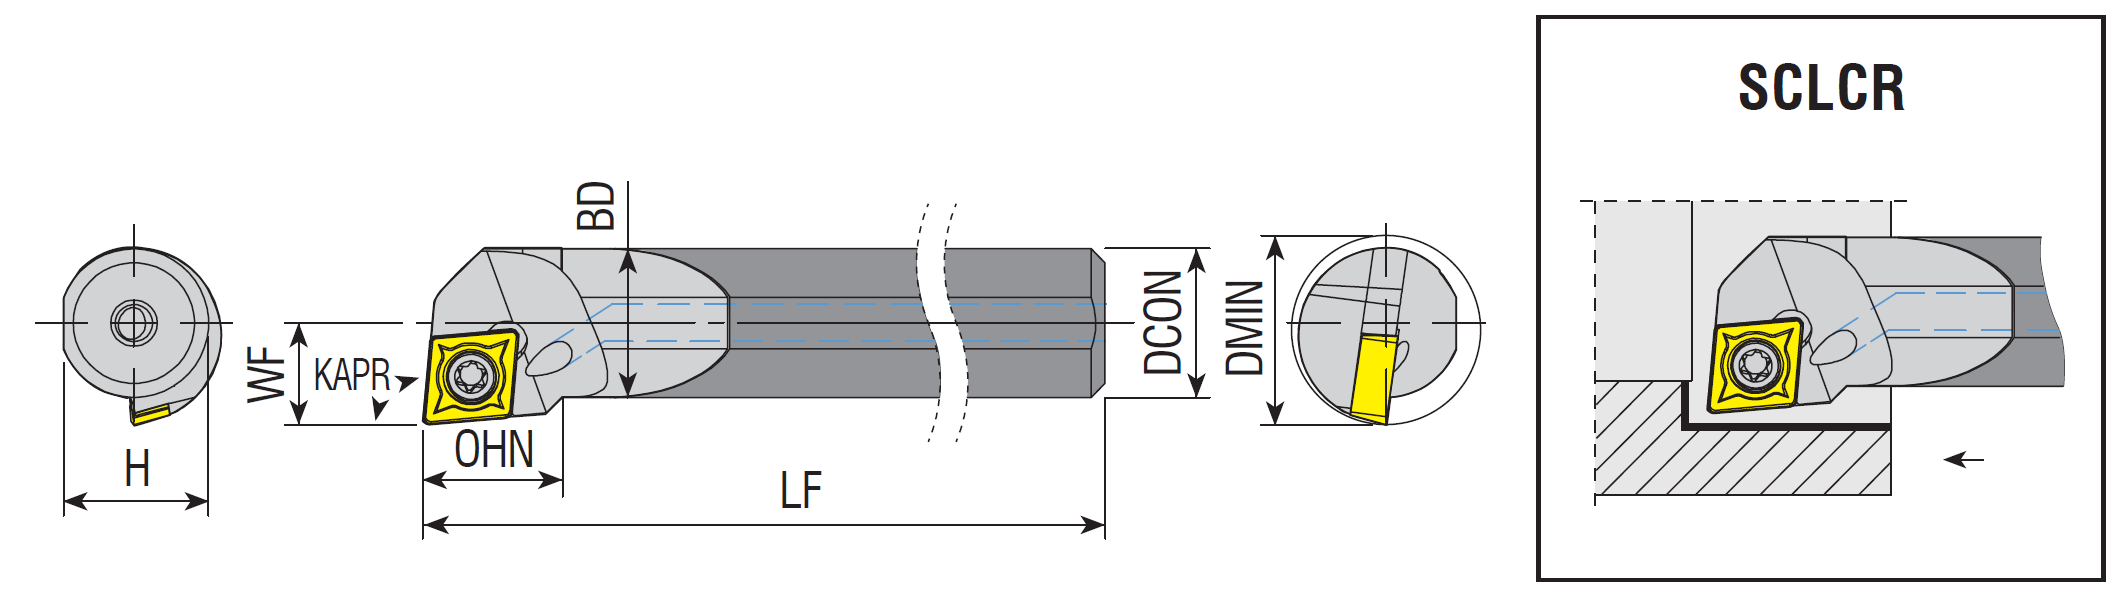 SET HM Bohrstangen mit Innenkühlung SCLCR / SCLCL